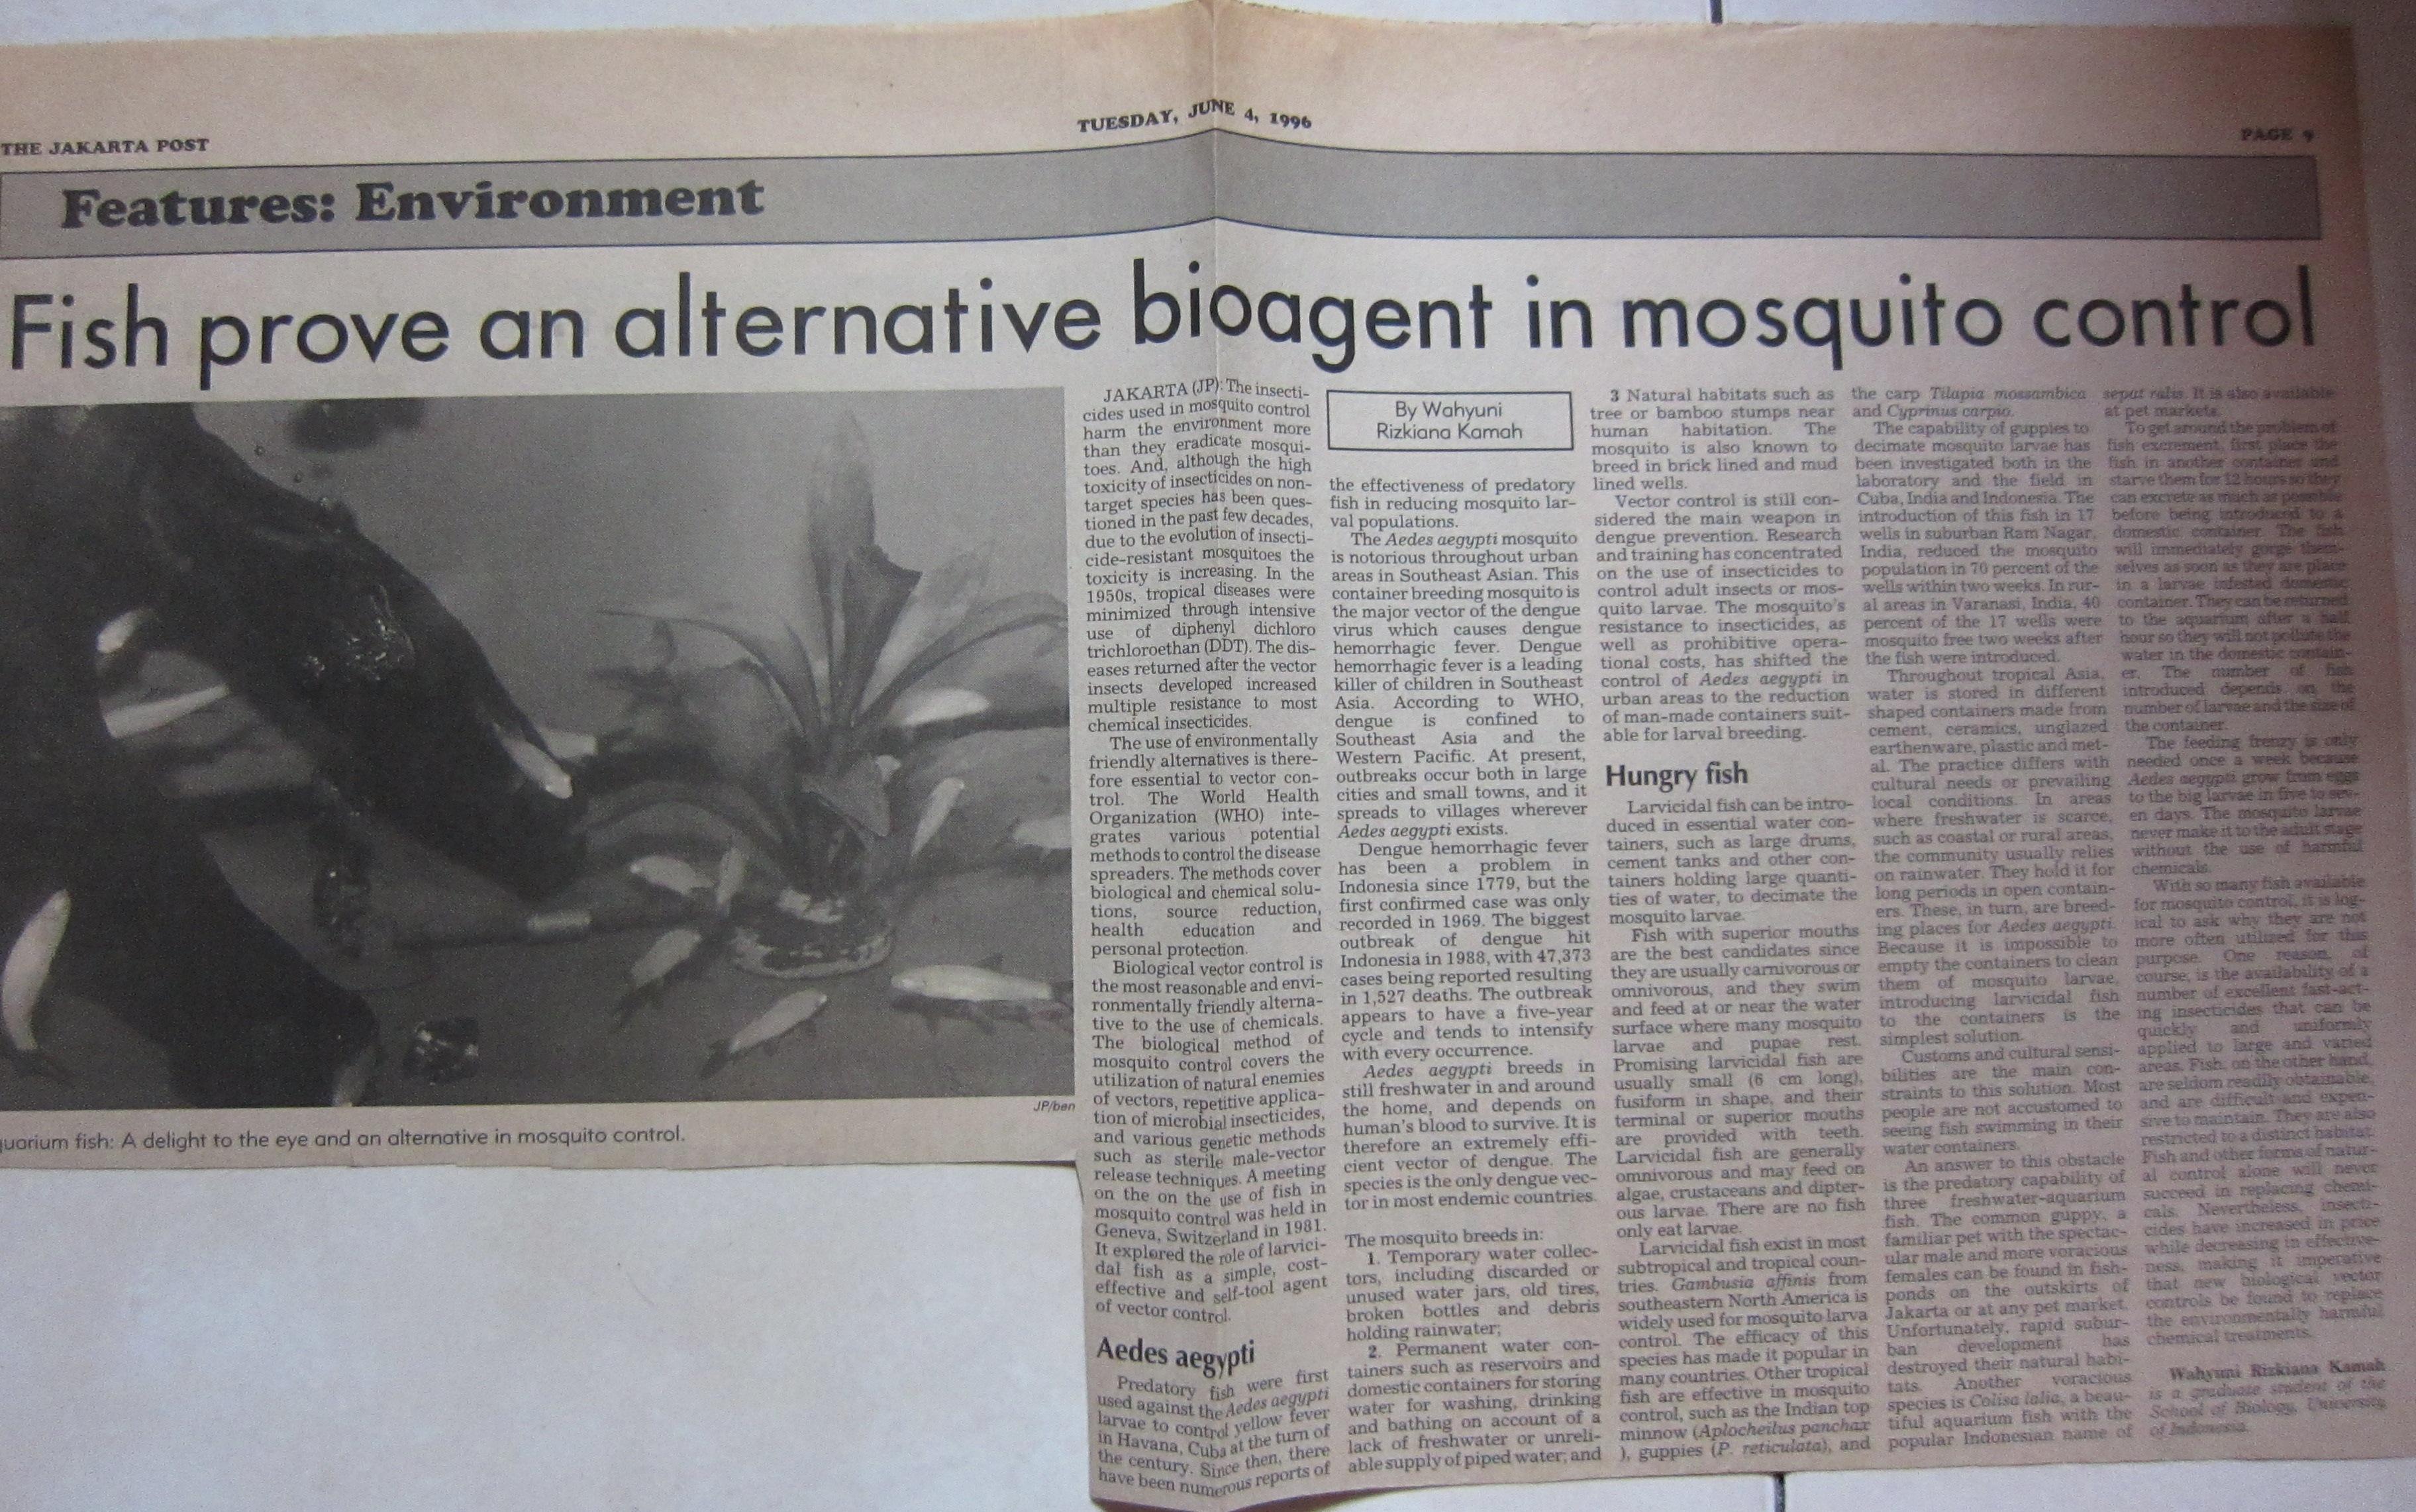 1996 June 6, The Jakarta Post, Fish proves